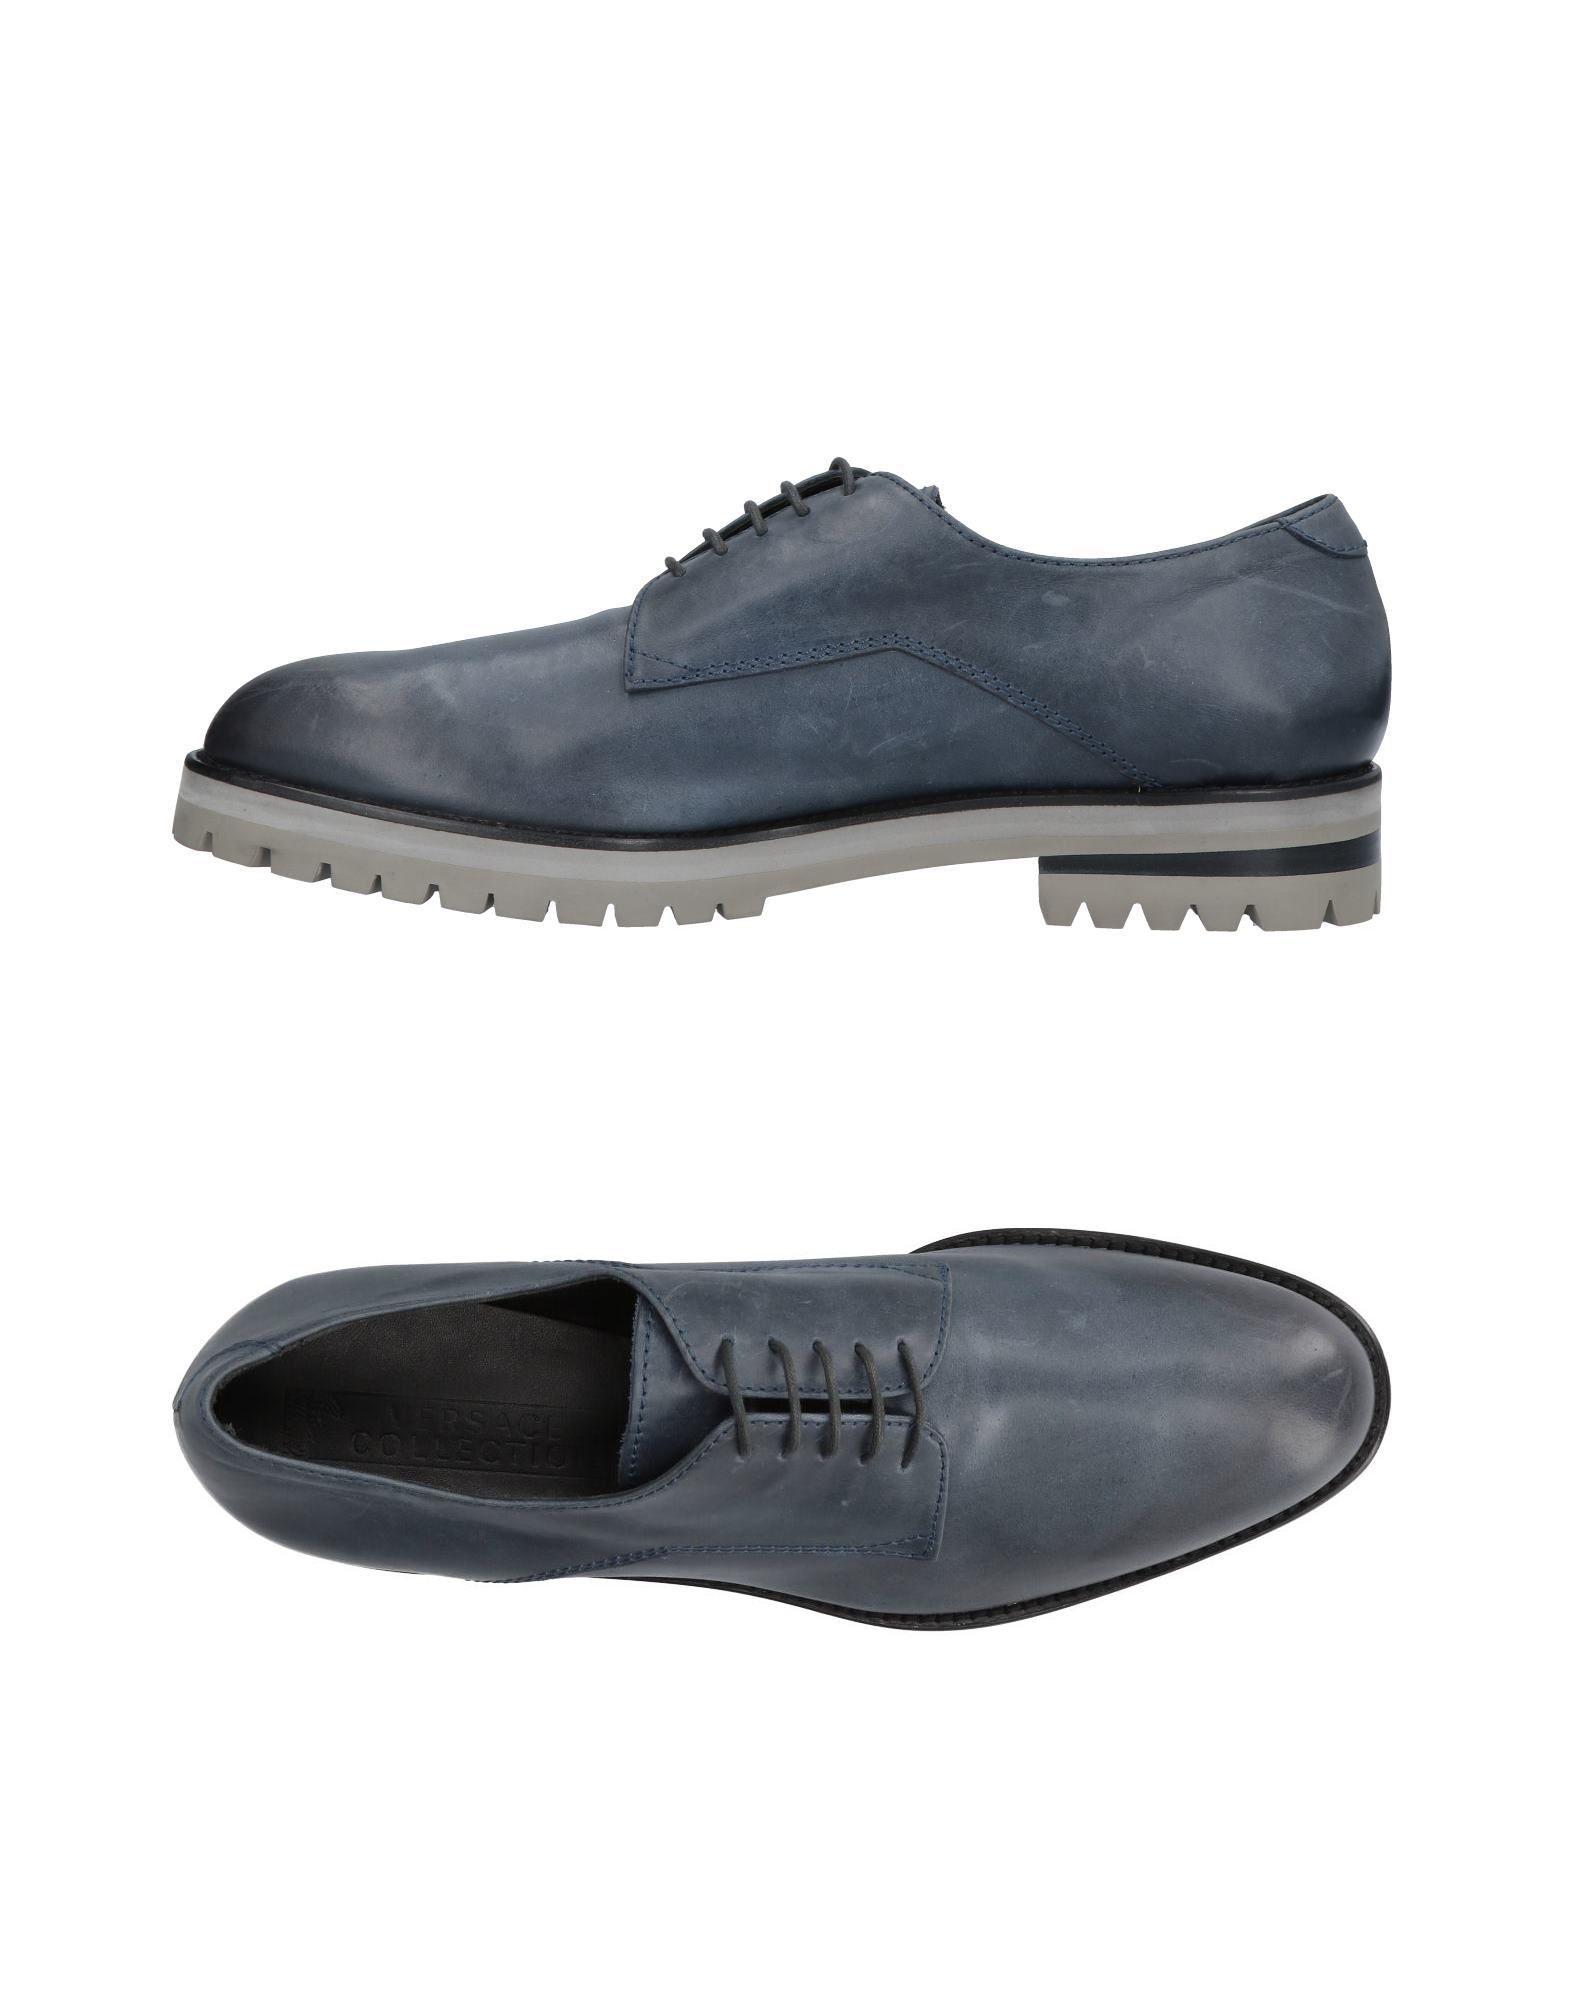 Chaussures À Lacets Versace Collection Homme - Chaussures À Lacets Versace Collection sur